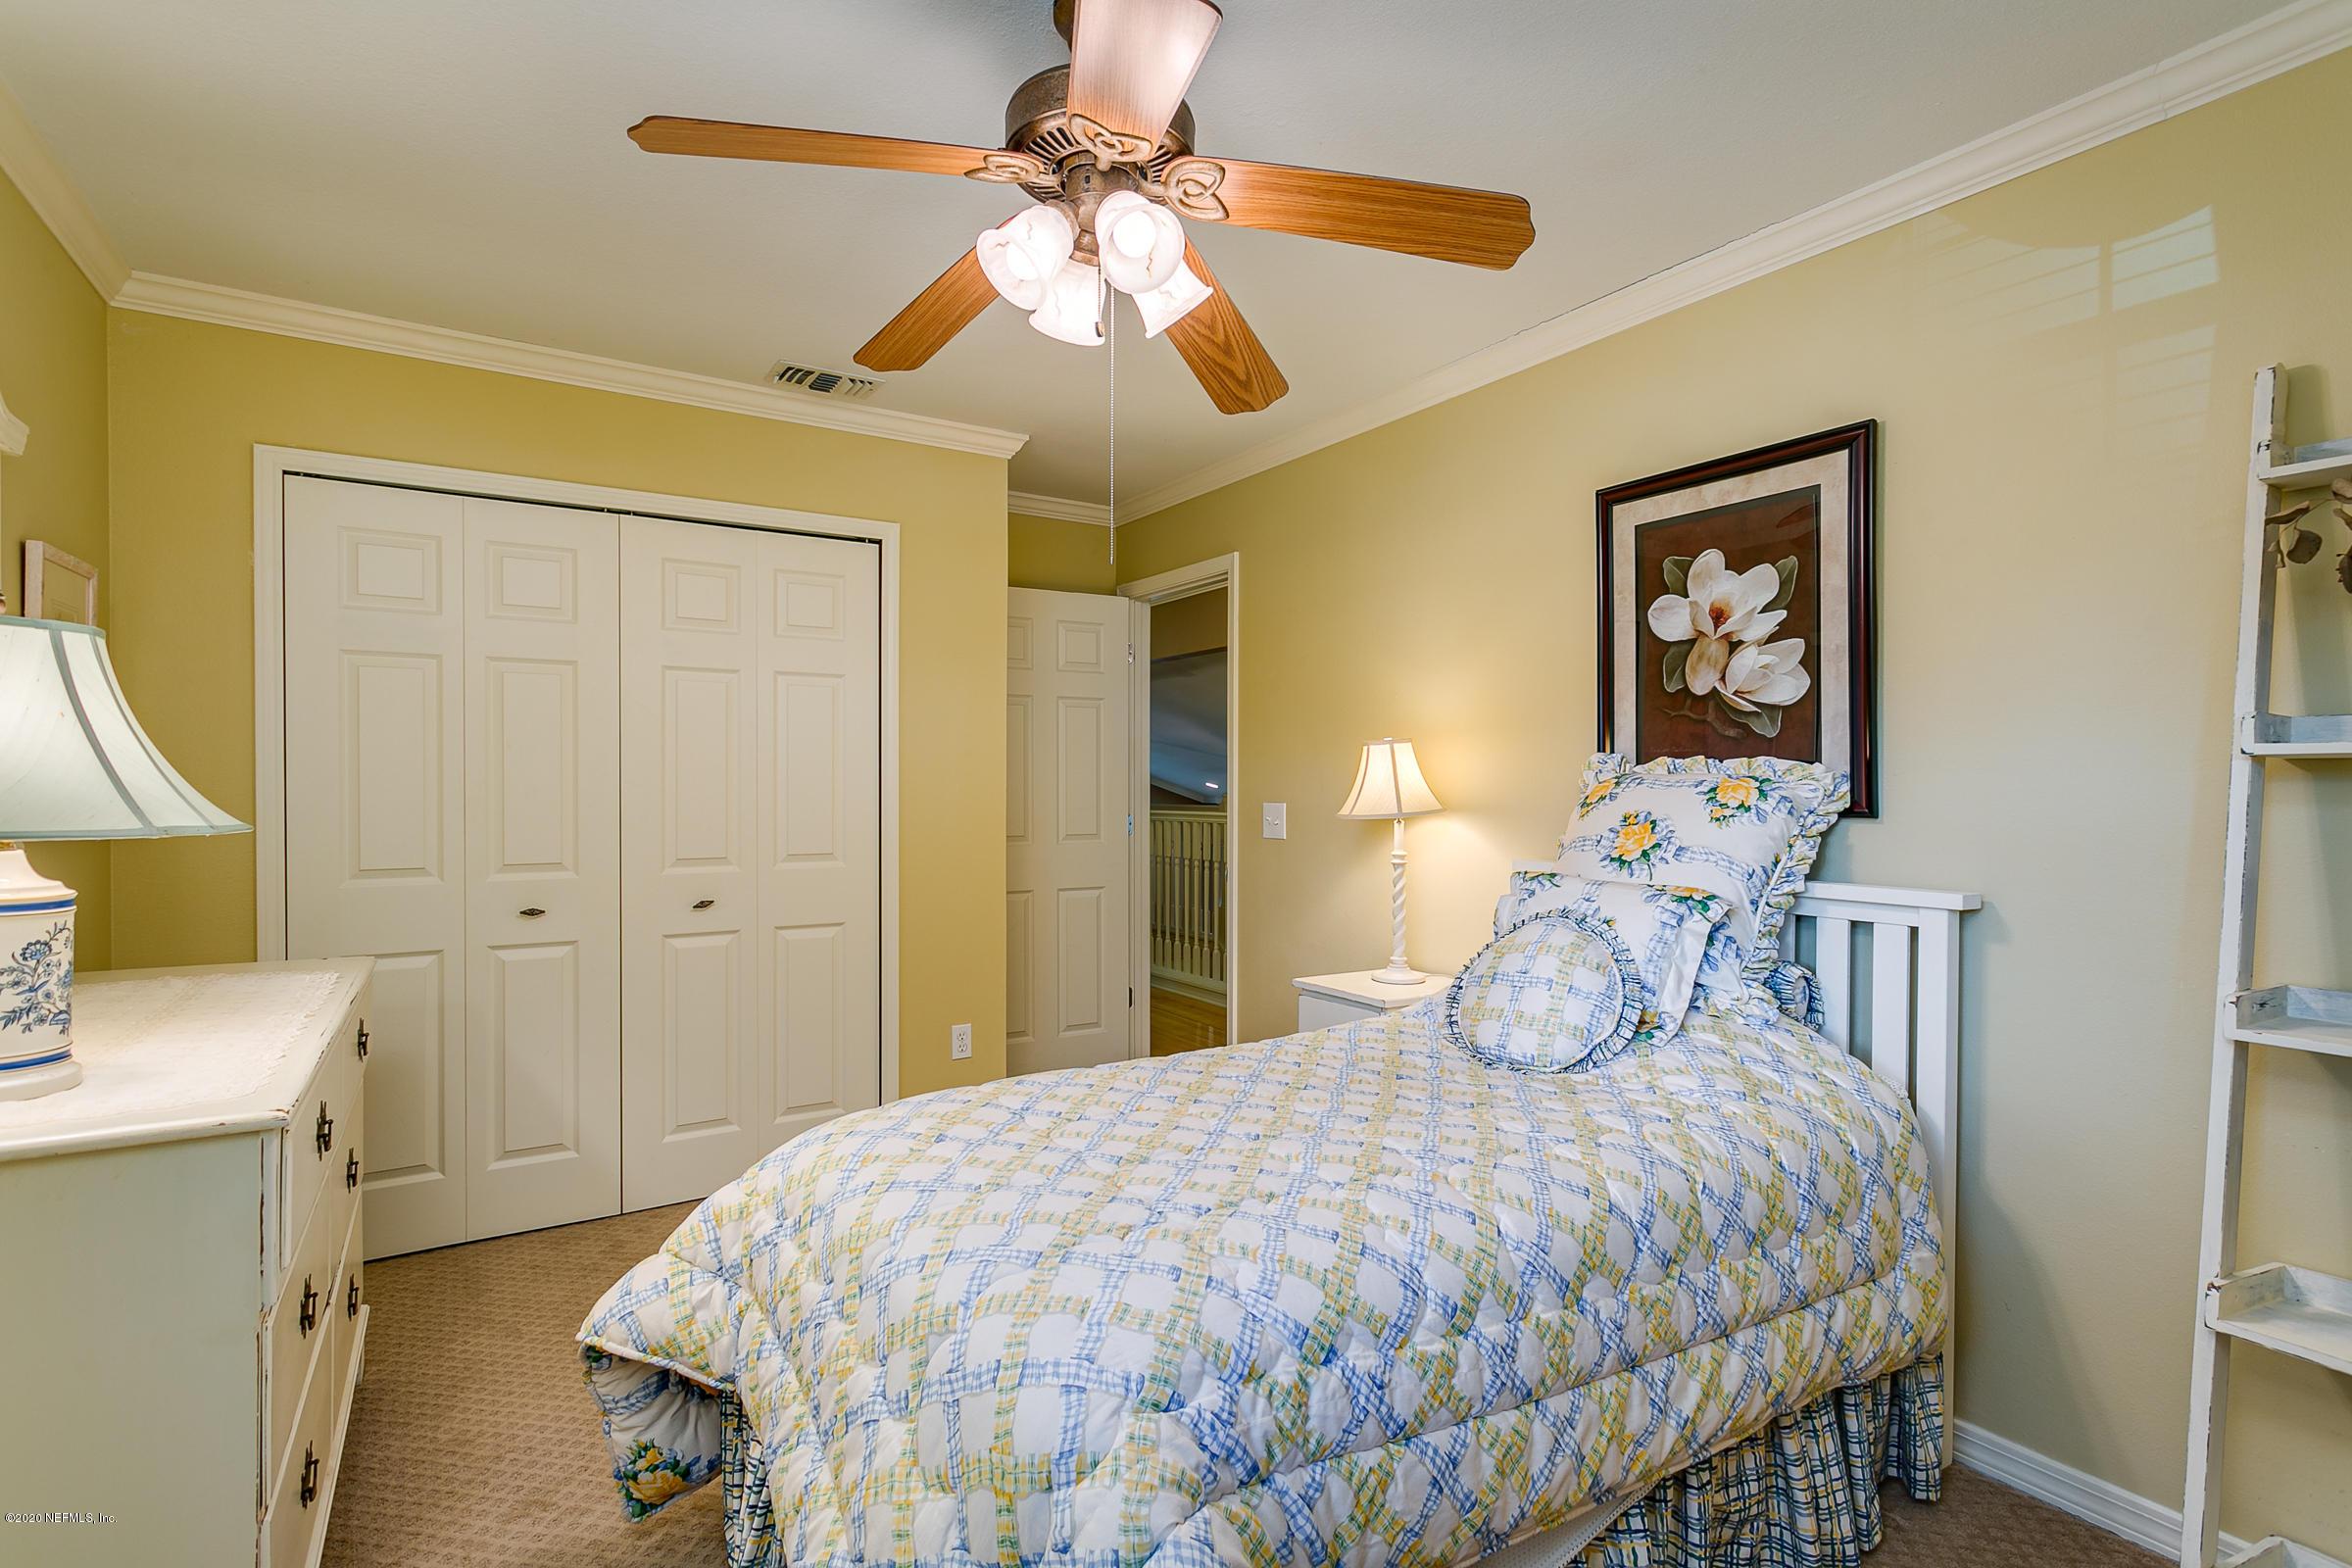 12154 ONE SPRINGMOOR, JACKSONVILLE, FLORIDA 32225, 4 Bedrooms Bedrooms, ,2 BathroomsBathrooms,Residential,For sale,ONE SPRINGMOOR,1077243